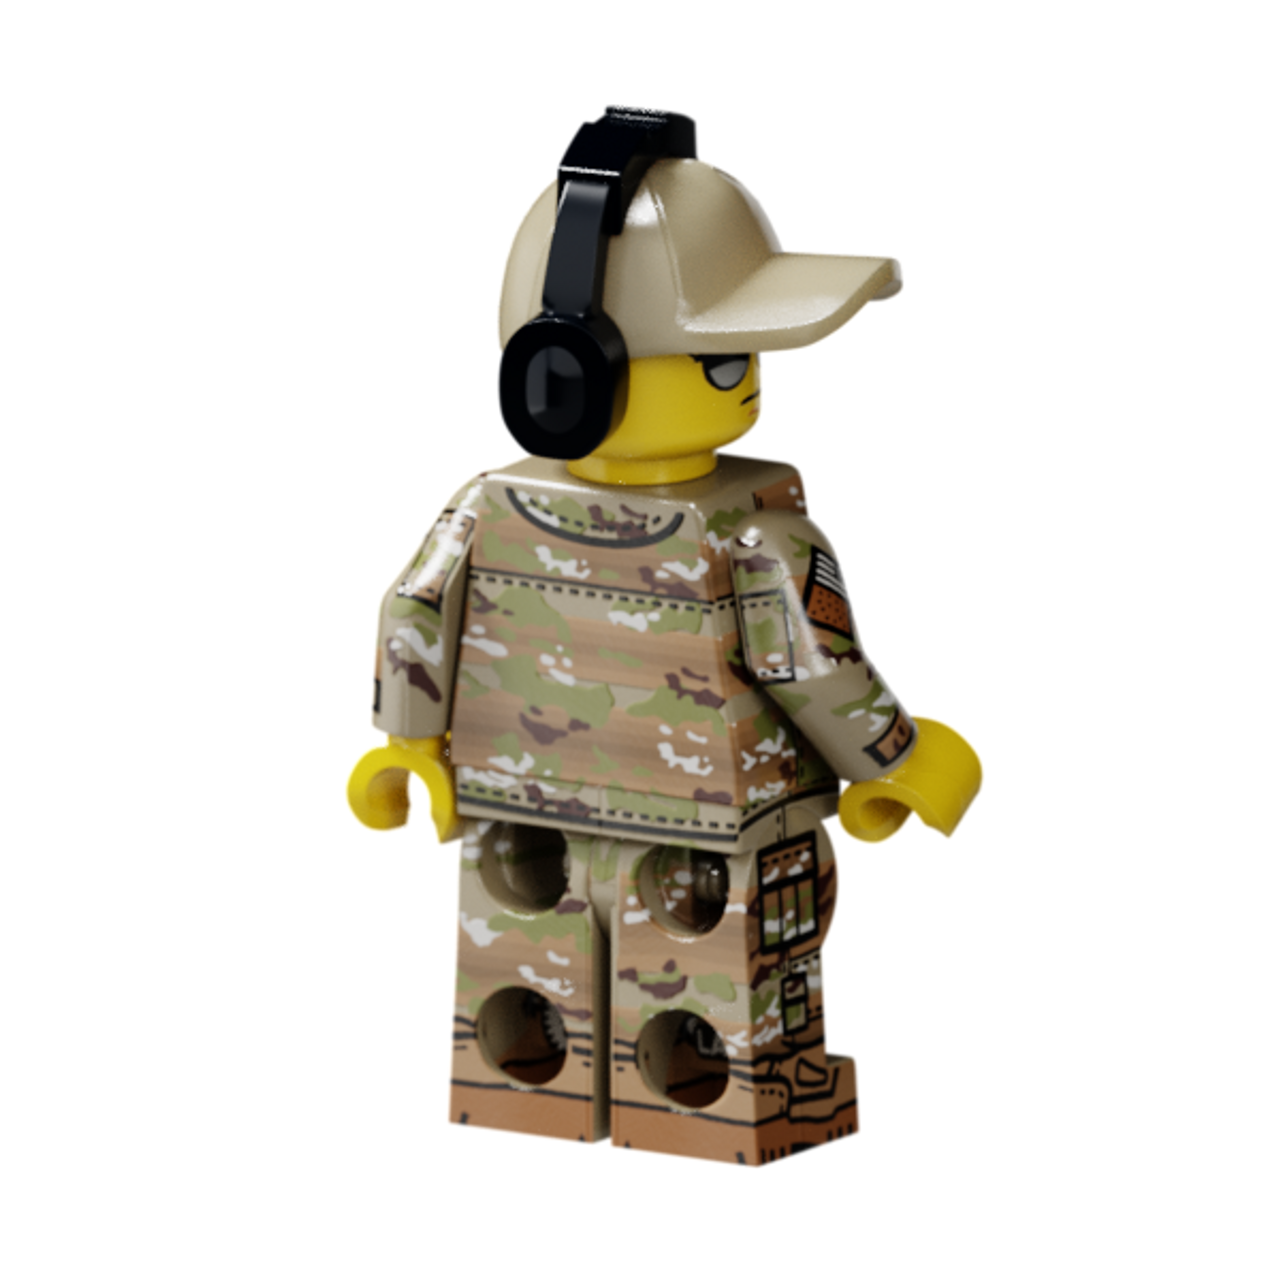 USAF Ground Crewman